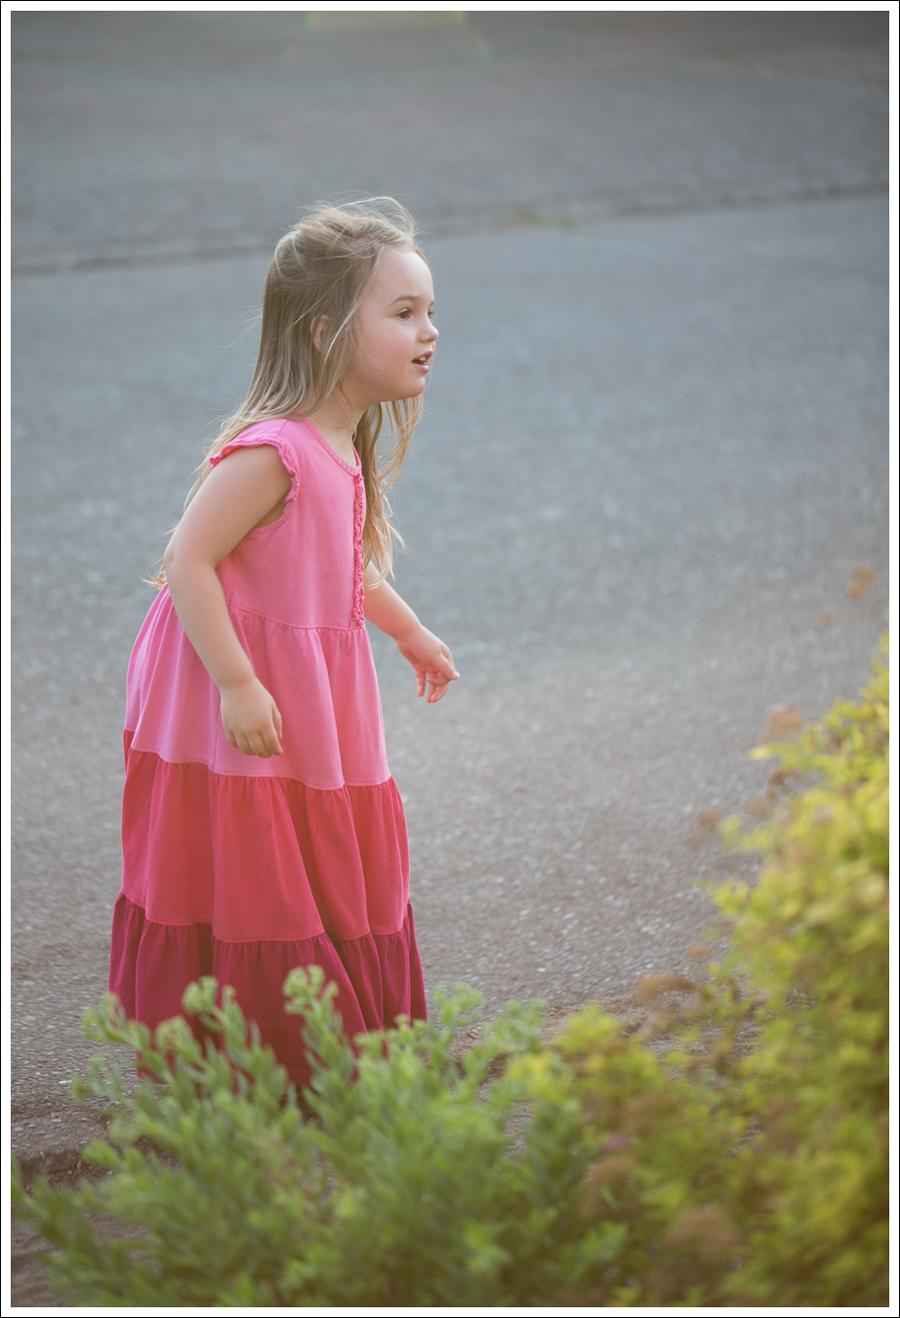 Blog Hanna Andersson Pink Twirl Dress White Saltwater Sandals-3